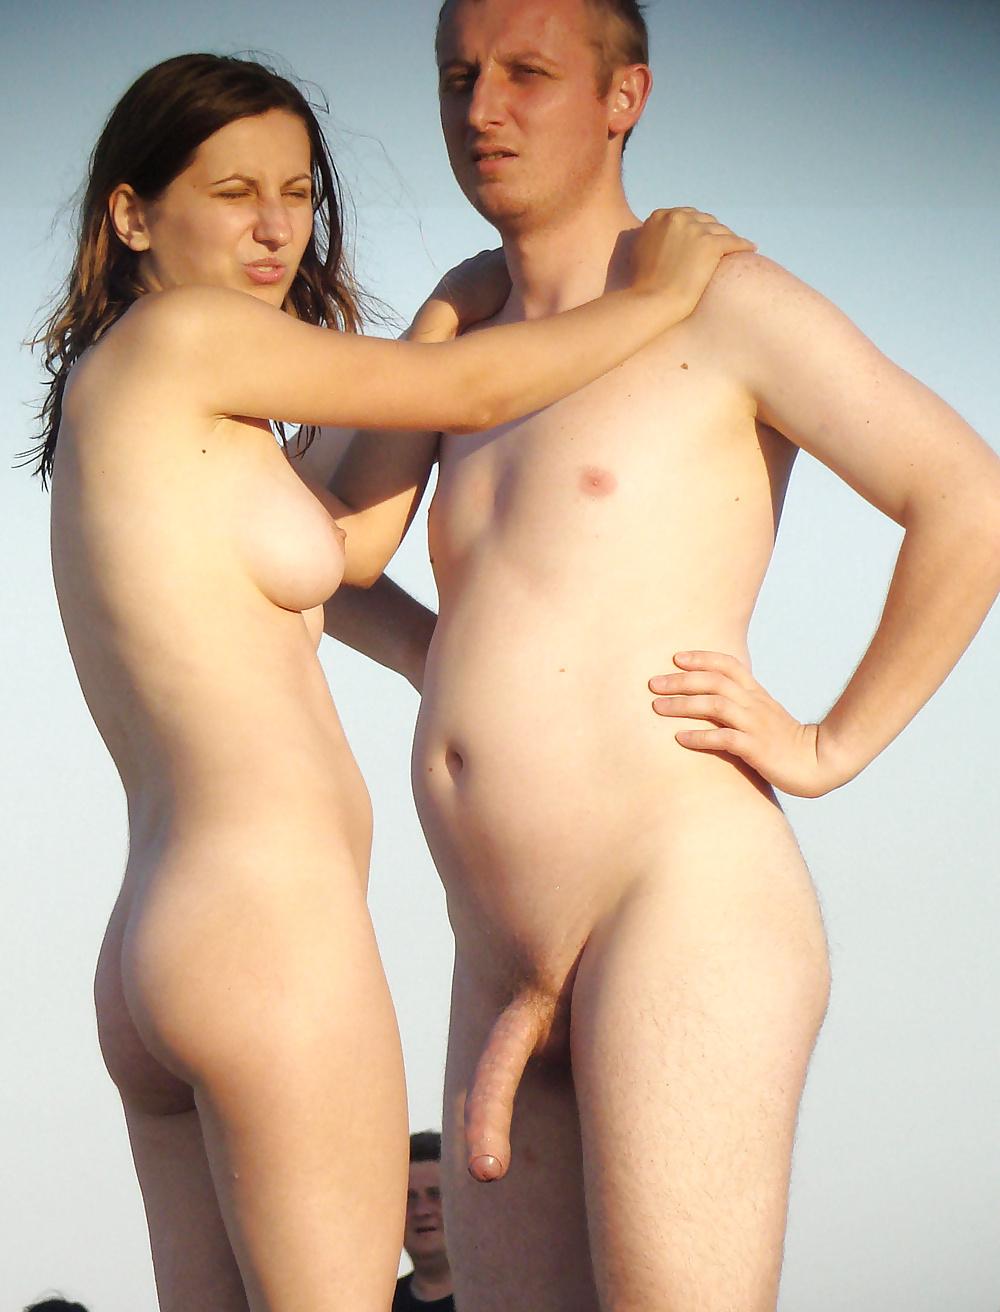 nude-couple-in-joy